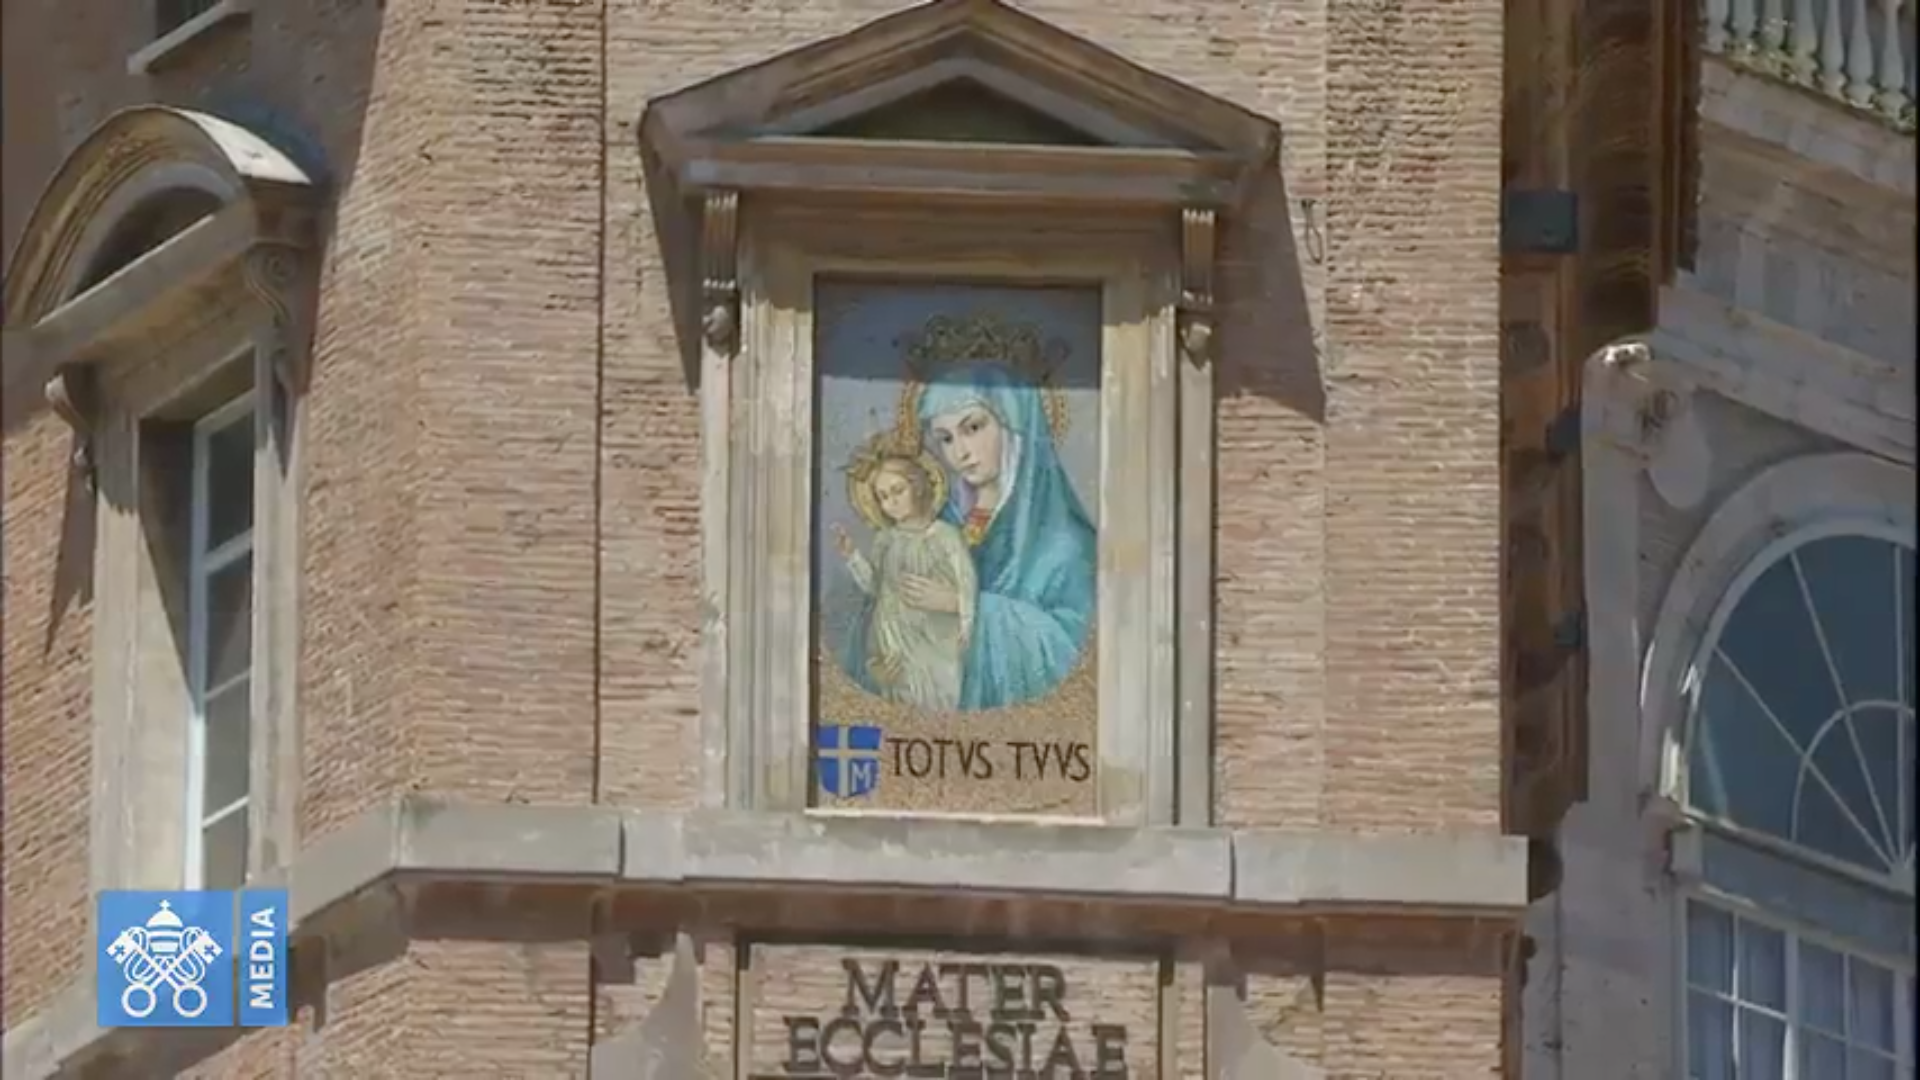 Marie Mater Ecclesiae Angélus 10/6/2018 capture @ Vatican Media